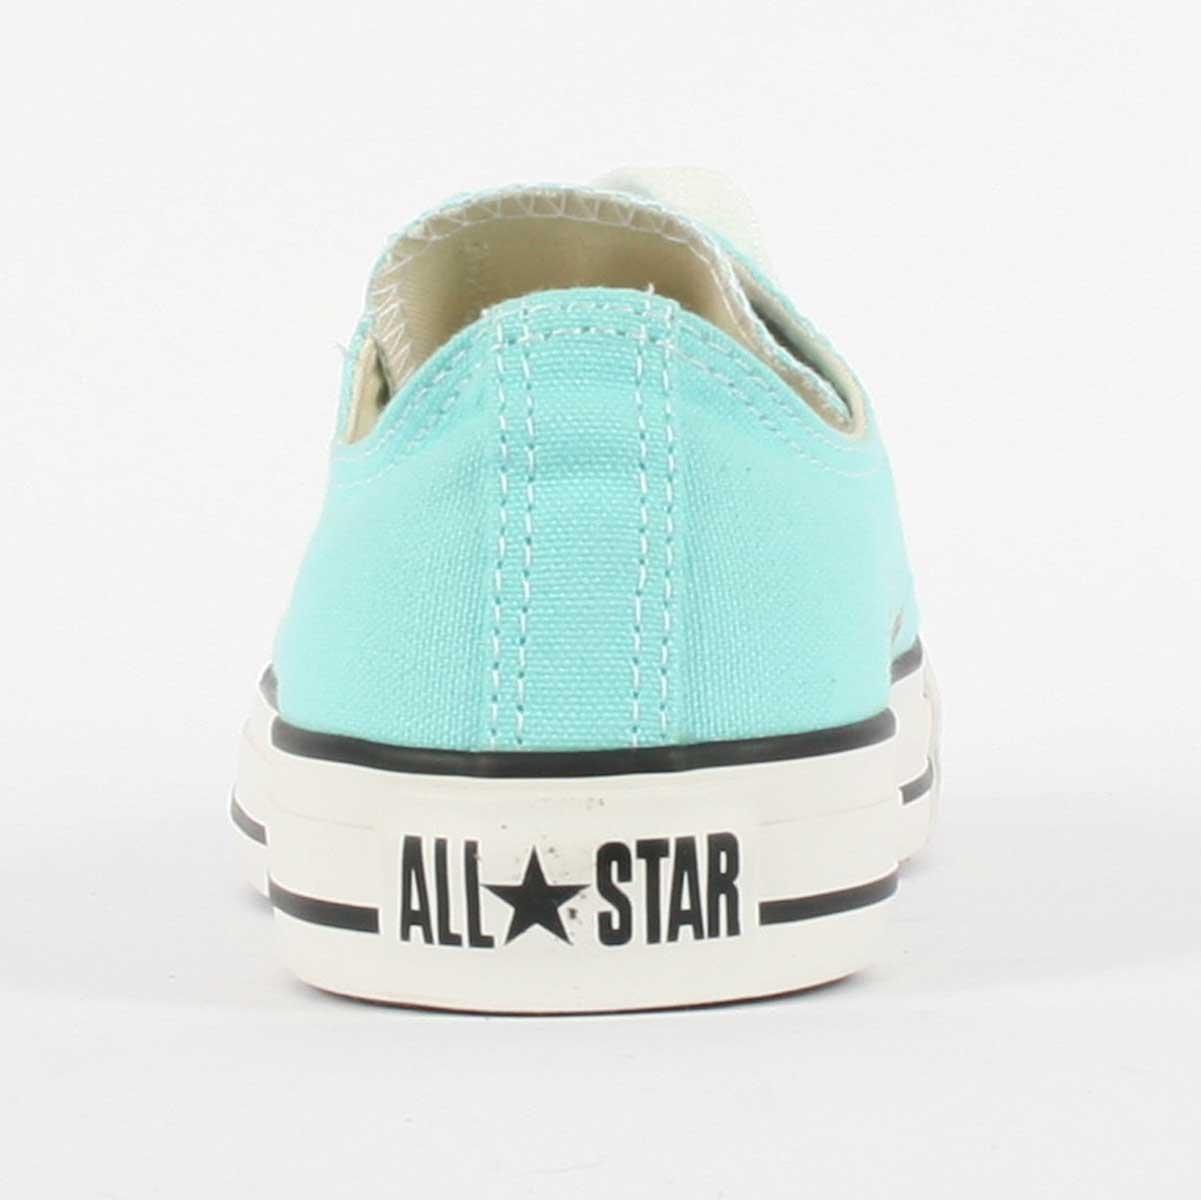 c3f60d2e6101 Converse Unisex Chuck Taylor All Star Low Top Aruba Blue Sneakers - 8 B(M)  US Women   6 D(M) US Men - 130118F   Fashion Sneakers   Clothing